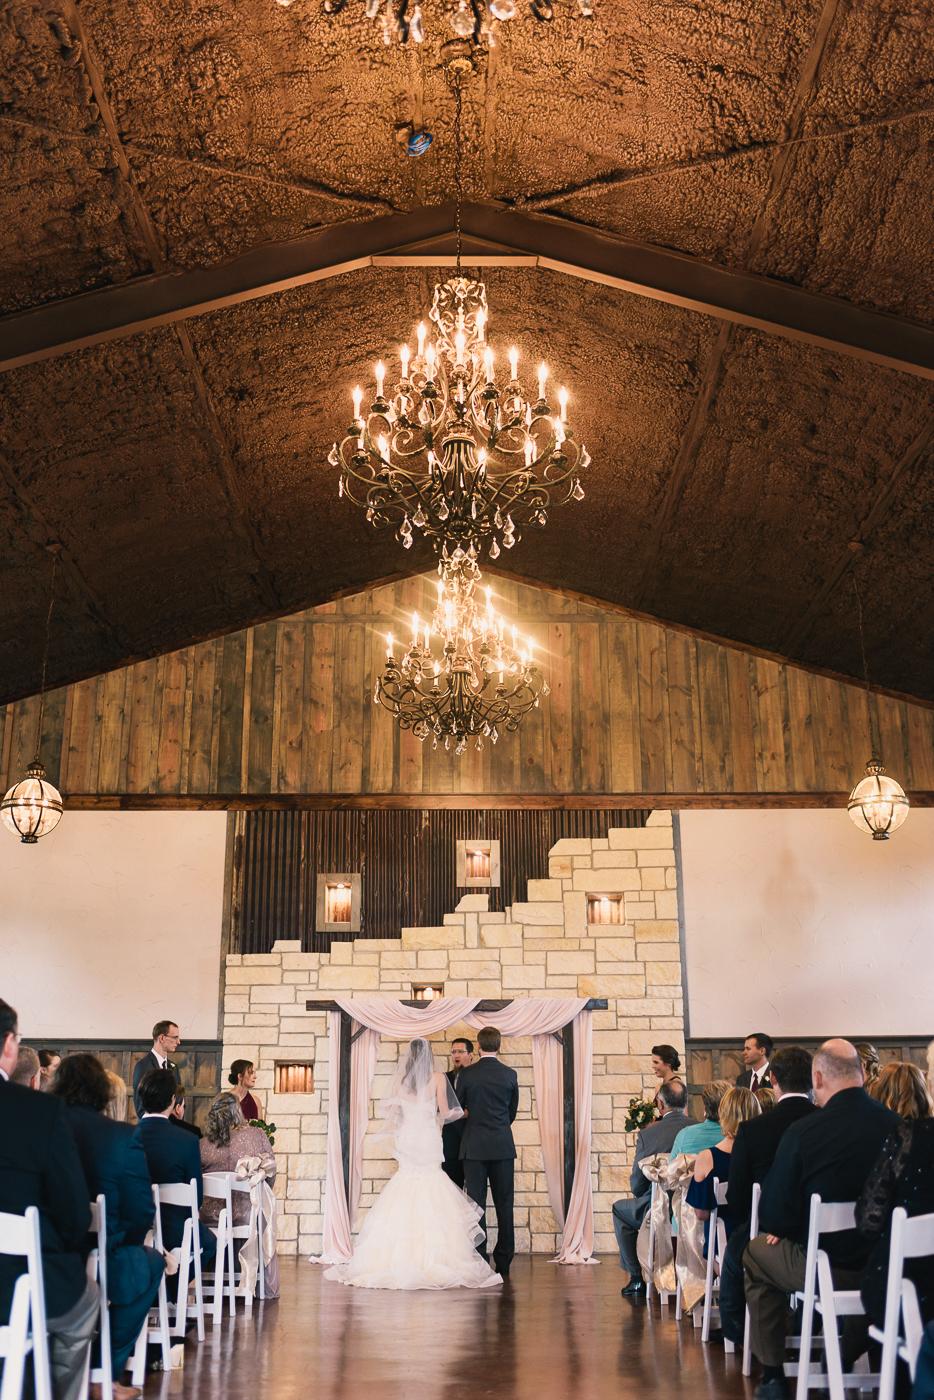 Wedding ceremony bride and groom altar chandelier